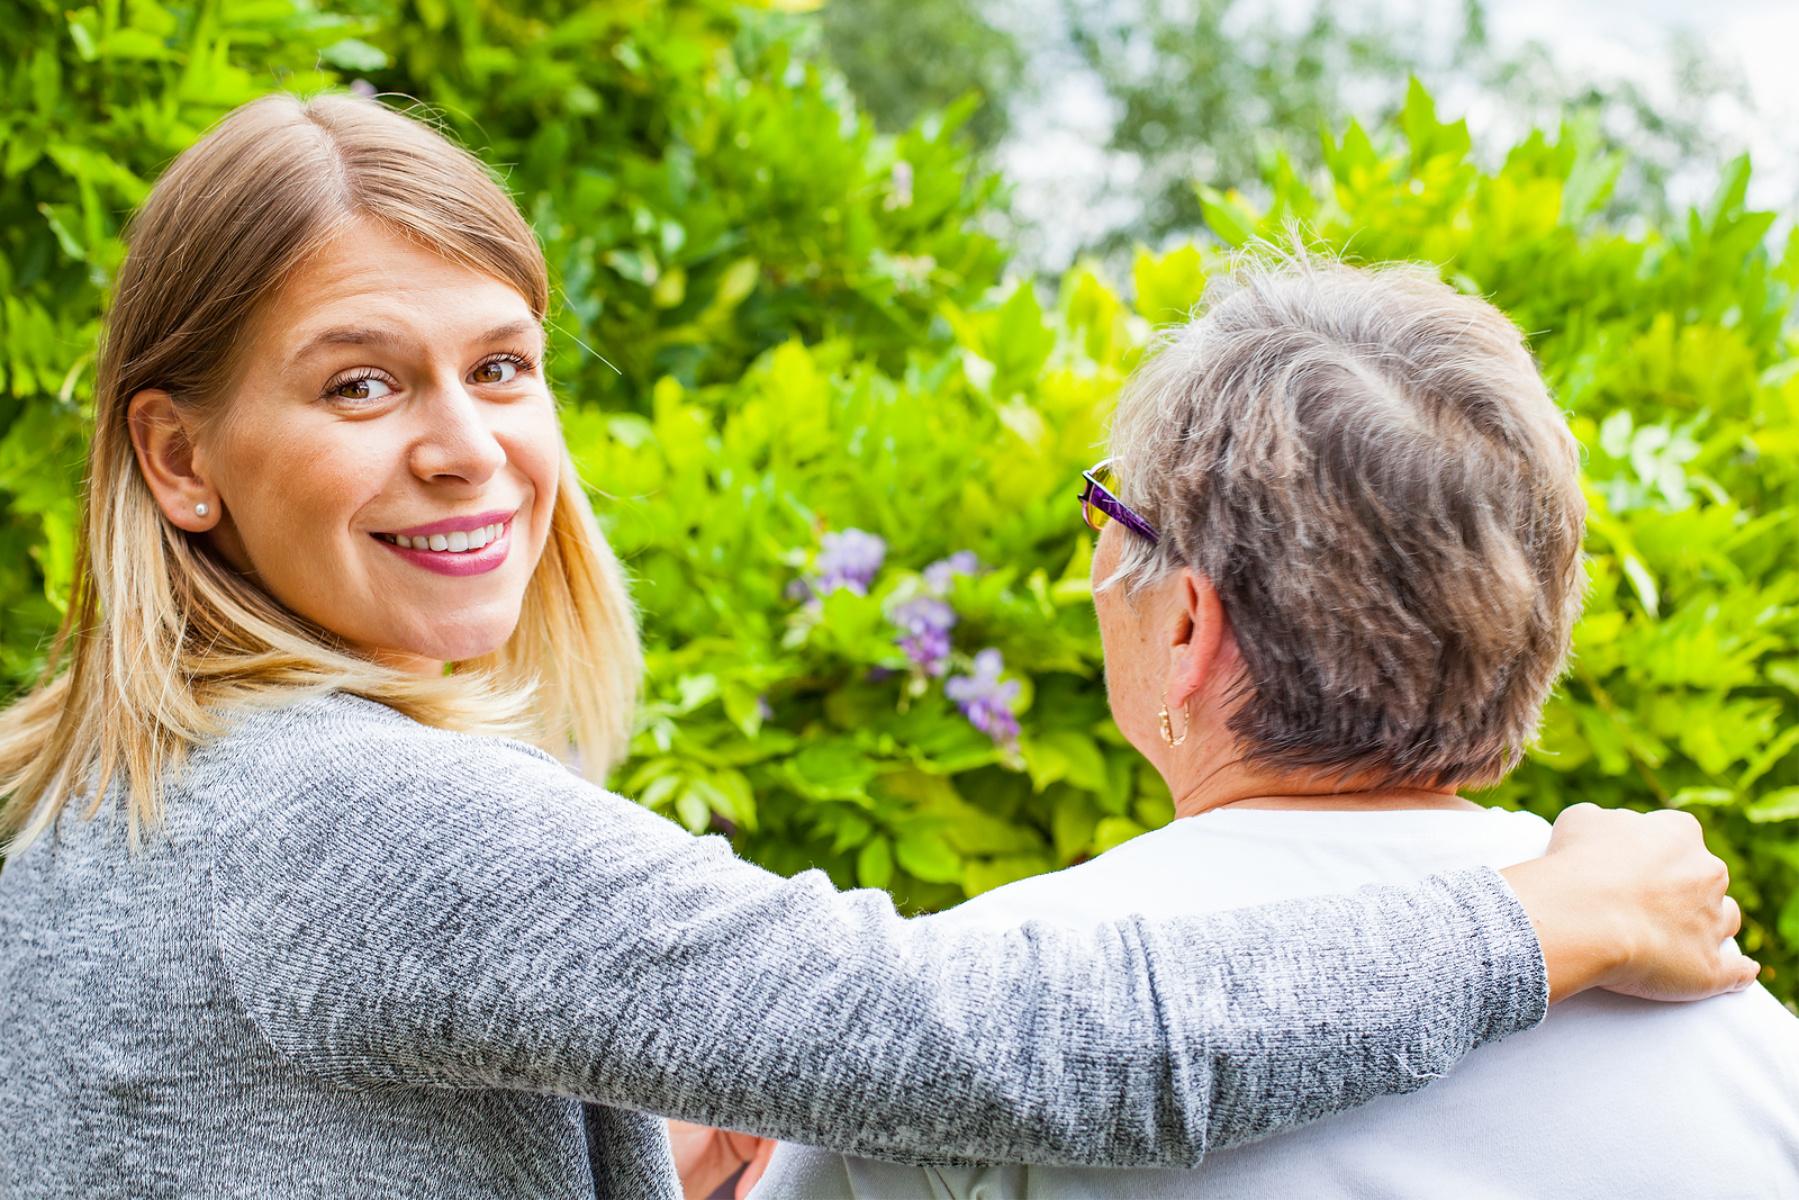 Caregiver in Glendale AZ: Caregiving Tips